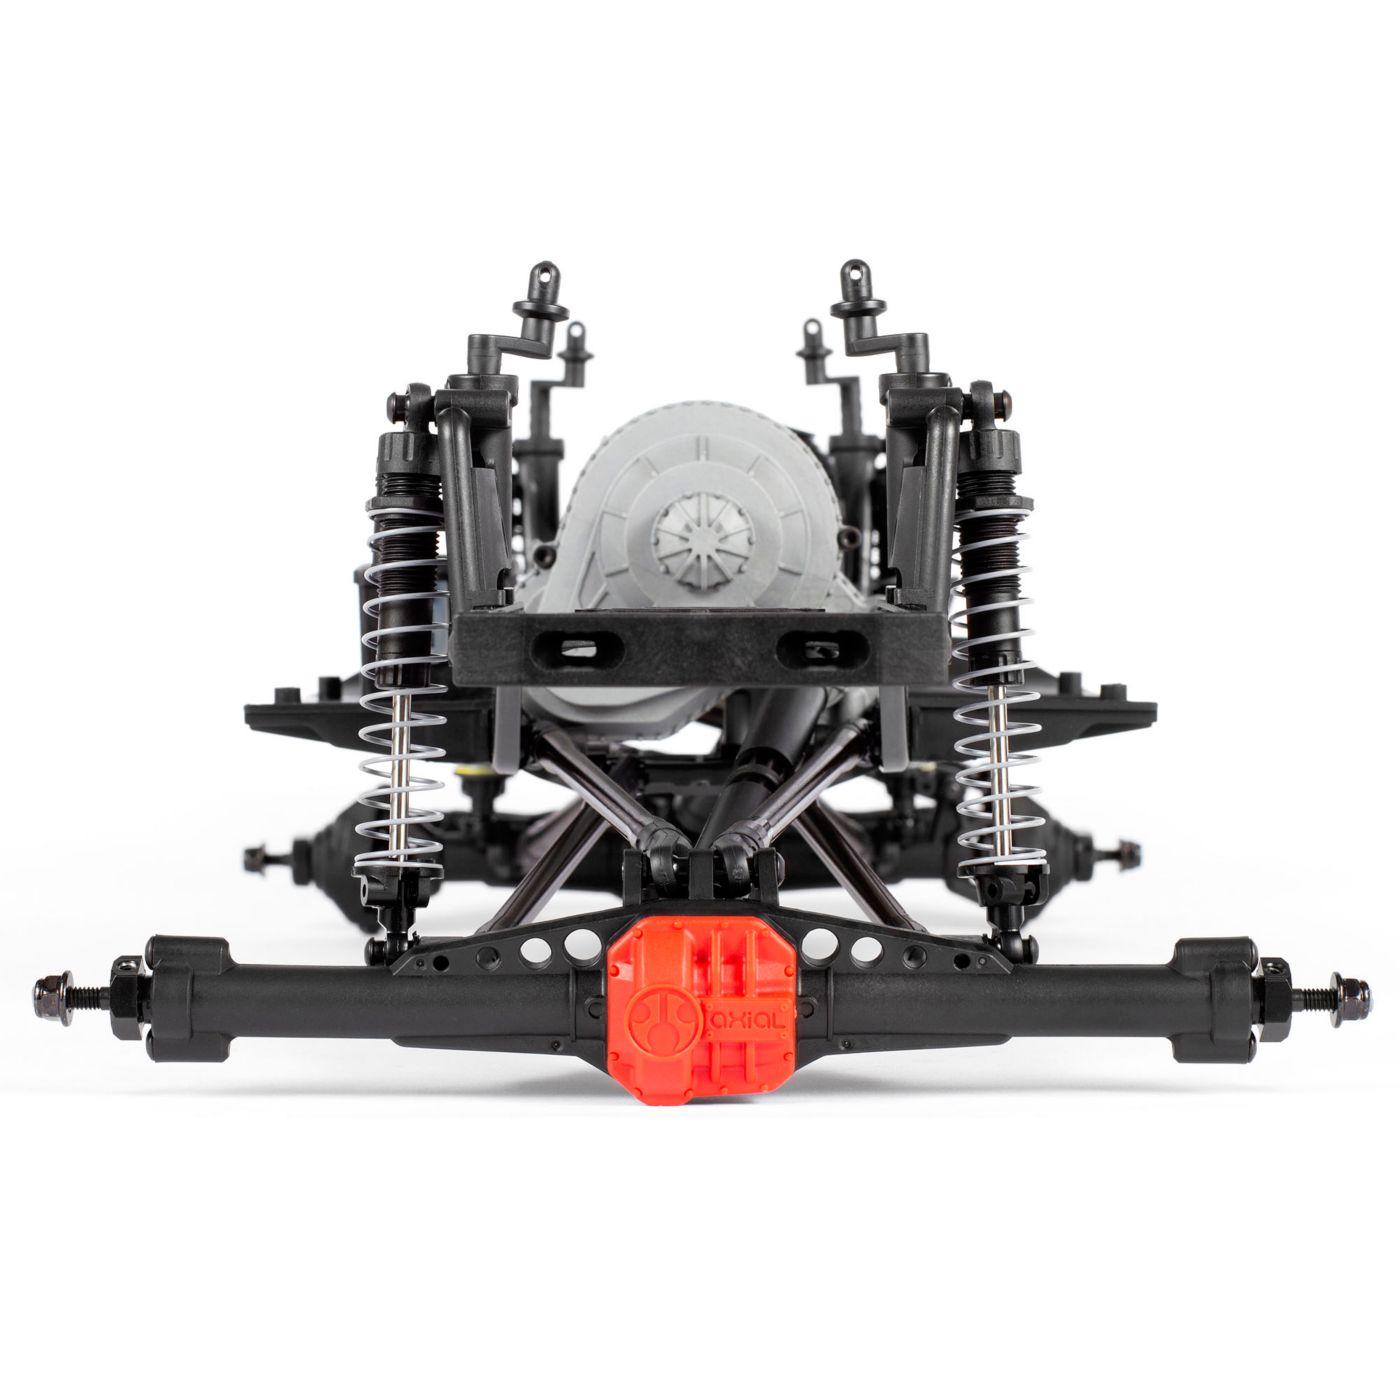 Axial 1/10 SCX10 II Raw Builders Kit